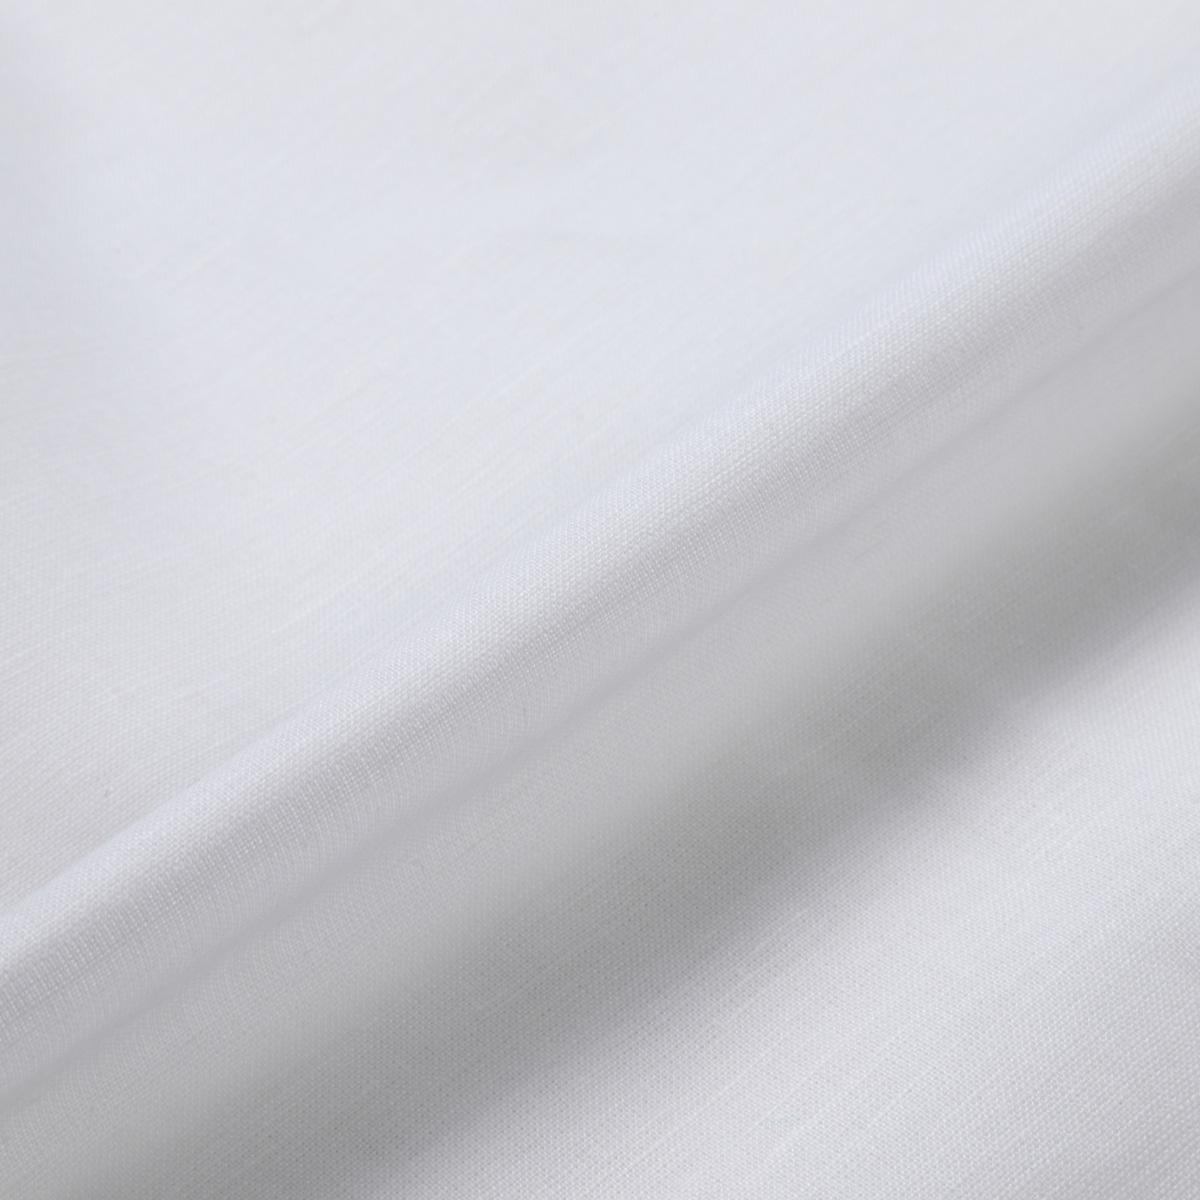 150cm巾【 コットンリネン 生地 】ホワイト  薄地 1m単位 R0045-200【シャツ、スカート、ワンピースに最適】